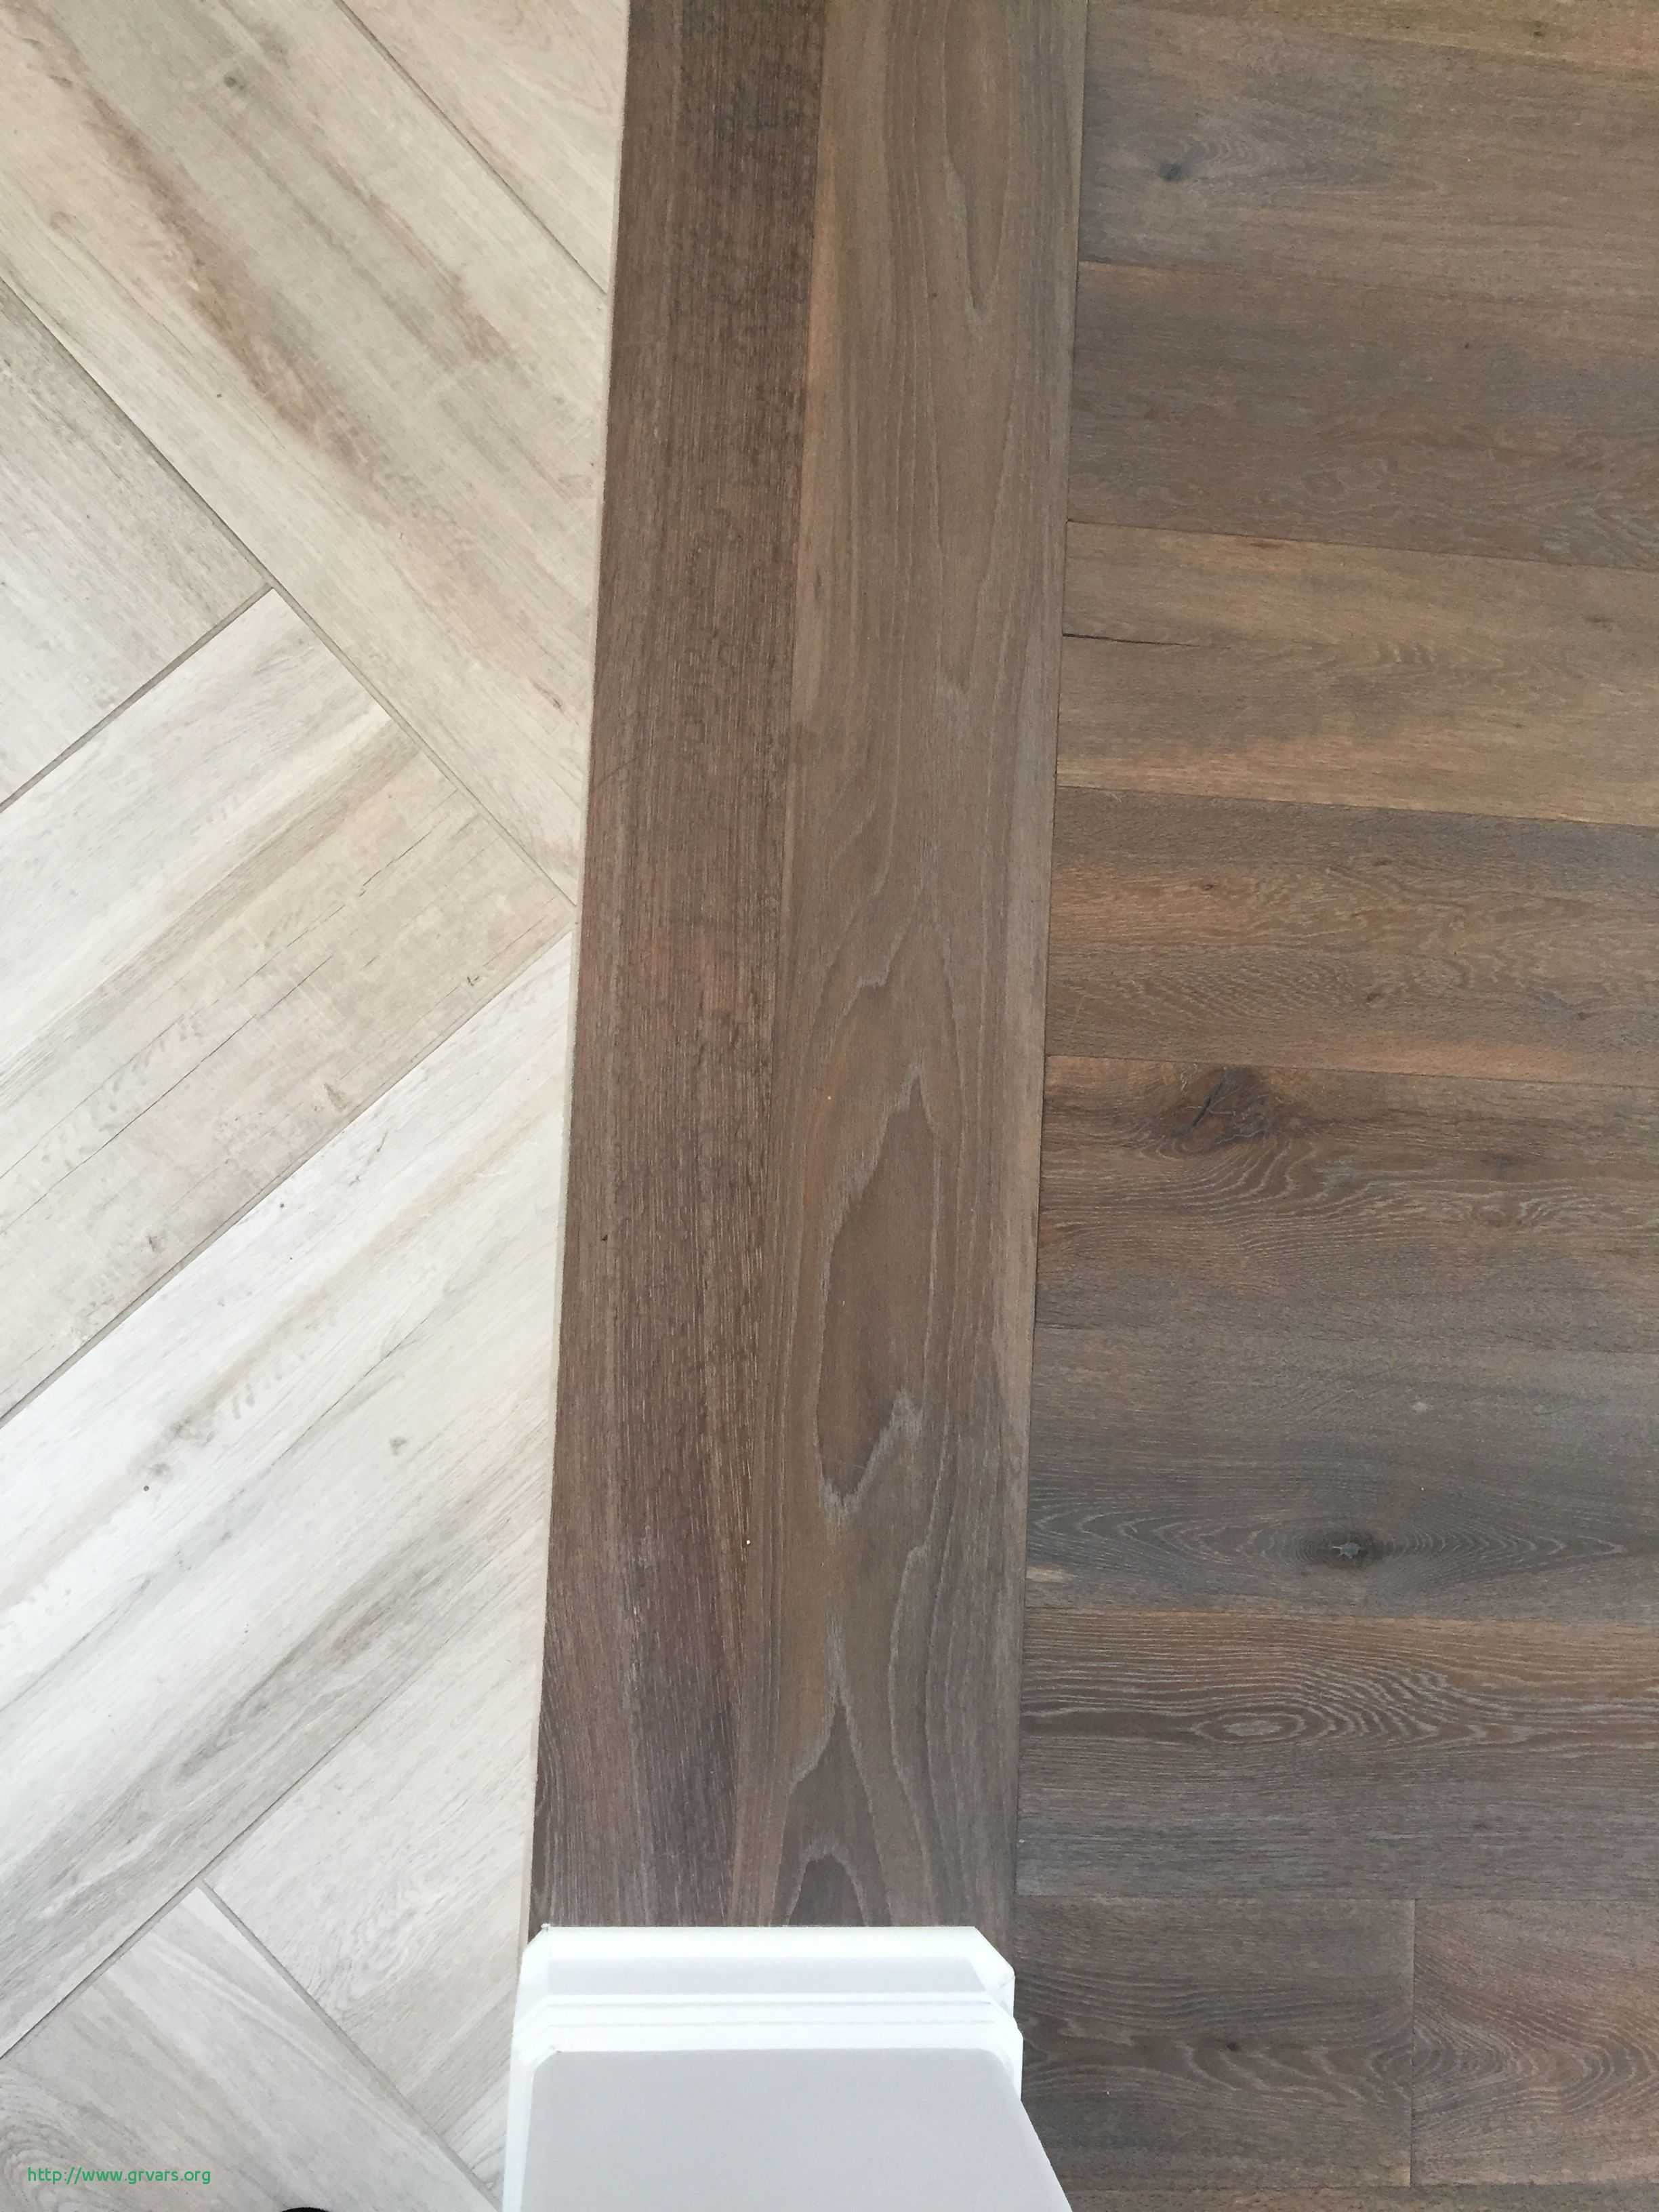 27 attractive Hardwood Floor Acclimation 2021 free download hardwood floor acclimation of 19 meilleur de strip flooring definition ideas blog for 19 photos of the 19 meilleur de strip flooring definition